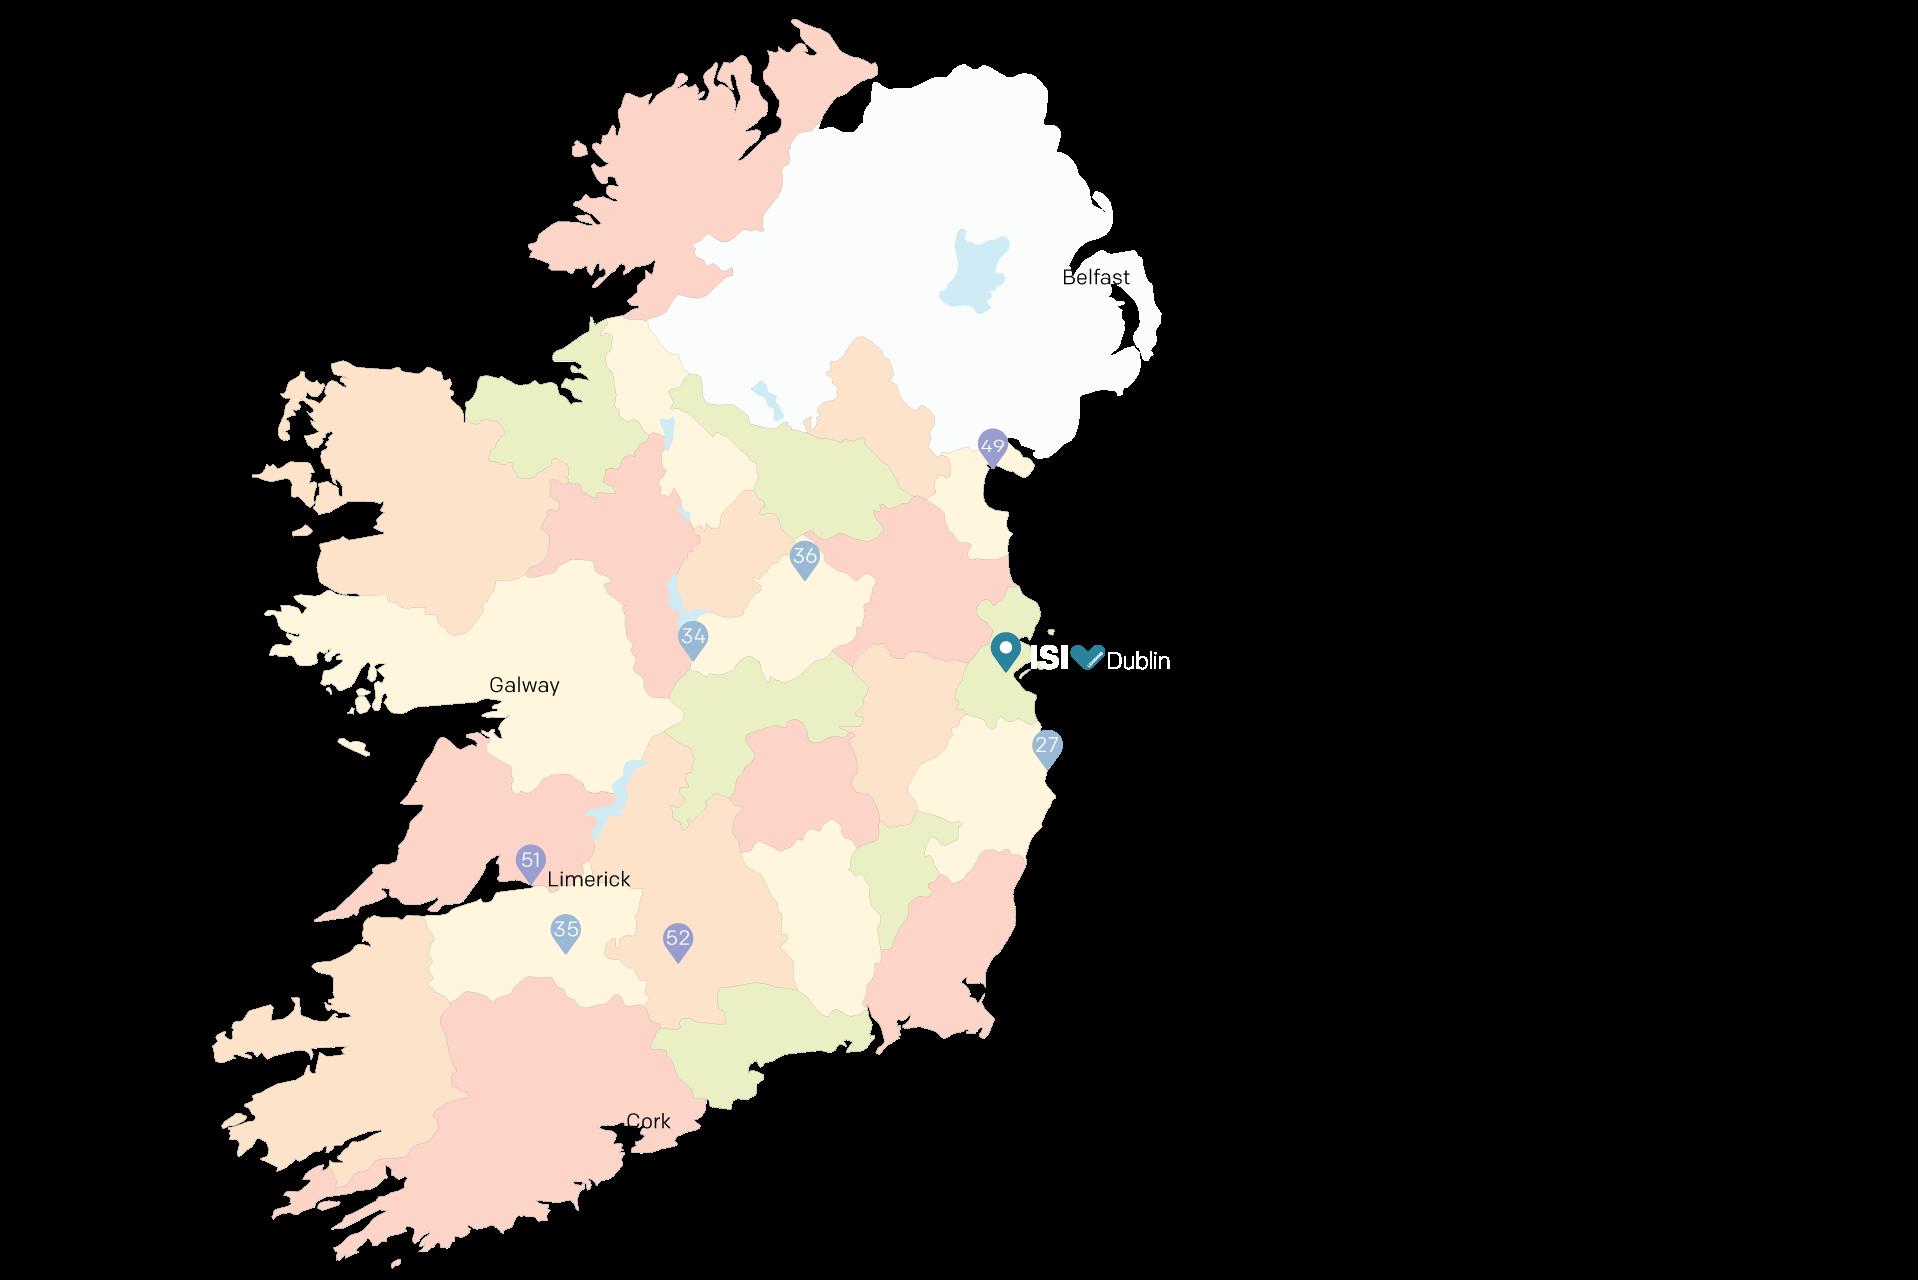 School locations in Ireland